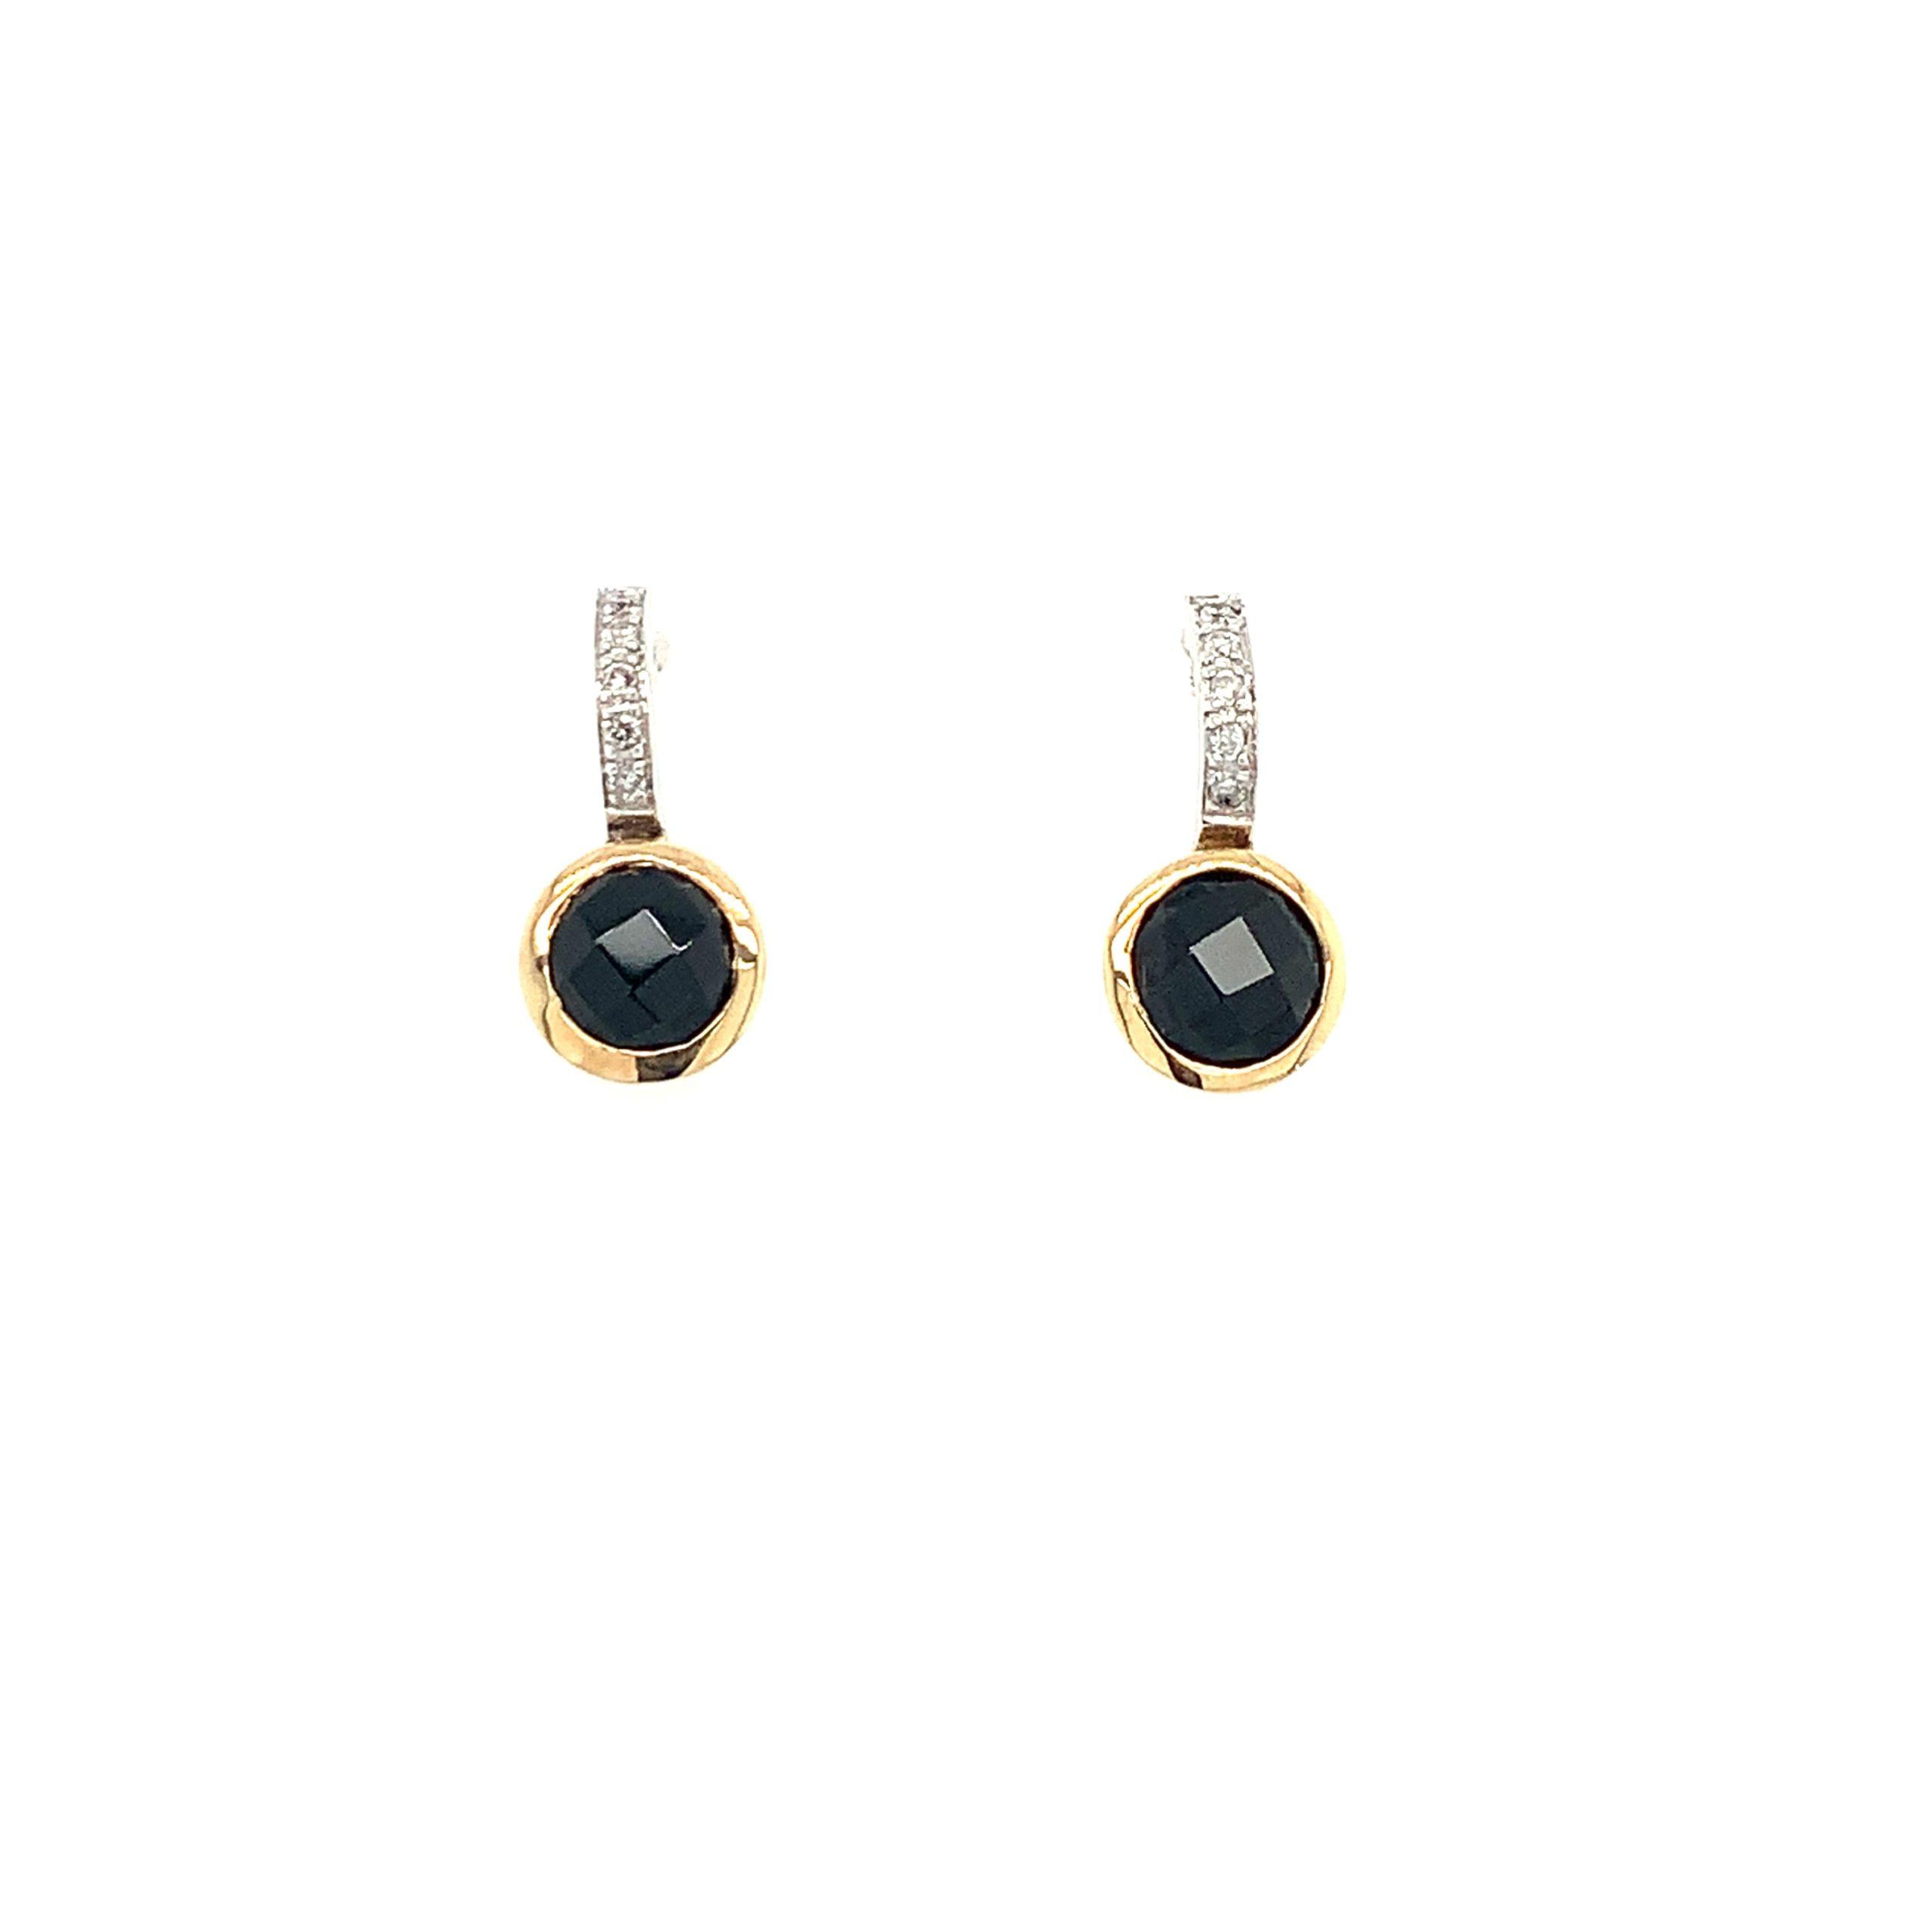 Two-Tone Gold Onyx Earrings